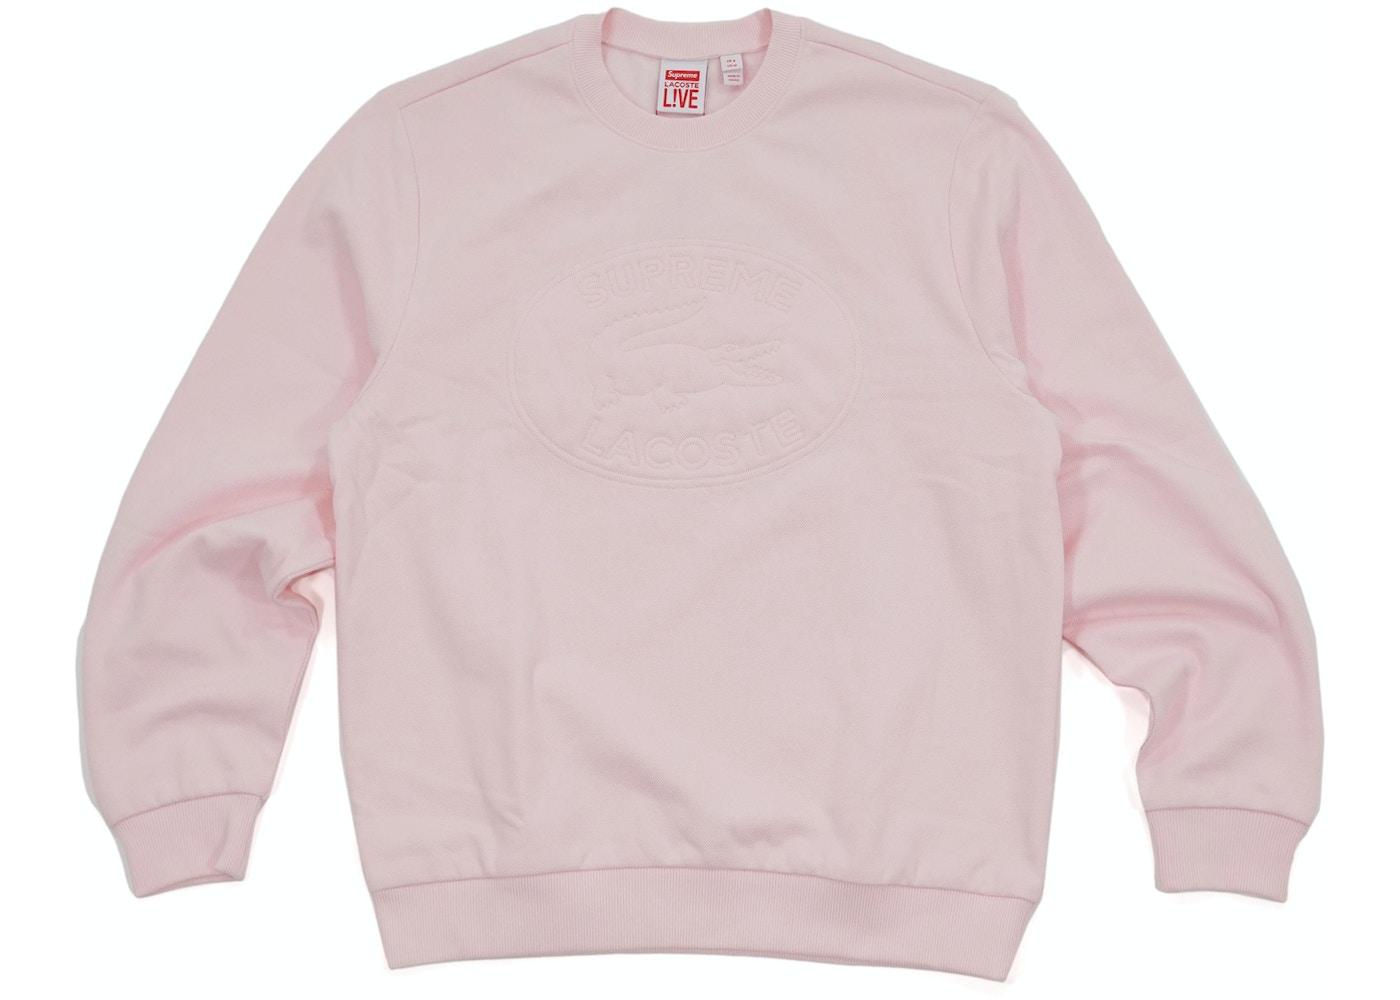 super popular 1a671 5b791 Supreme Lacoste Pique Crewneck Light Pink - SS17